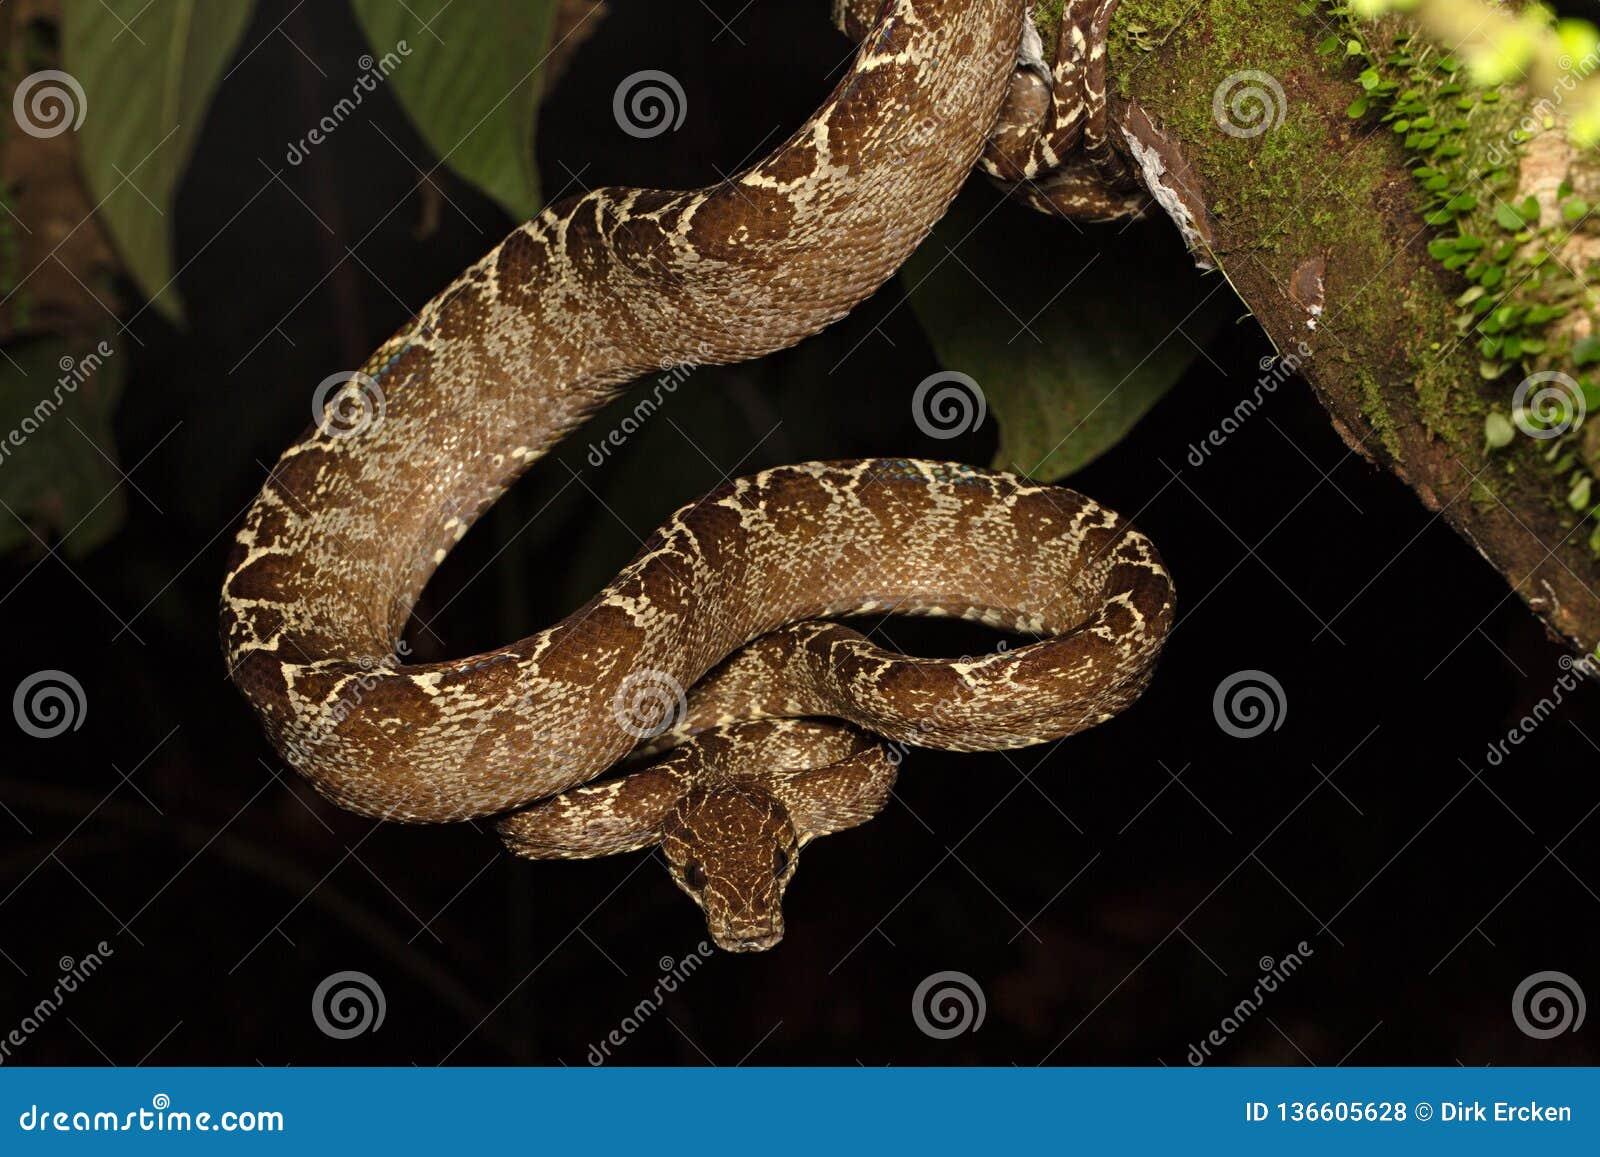 Tropical snake, tree boa Corallus hortulanus